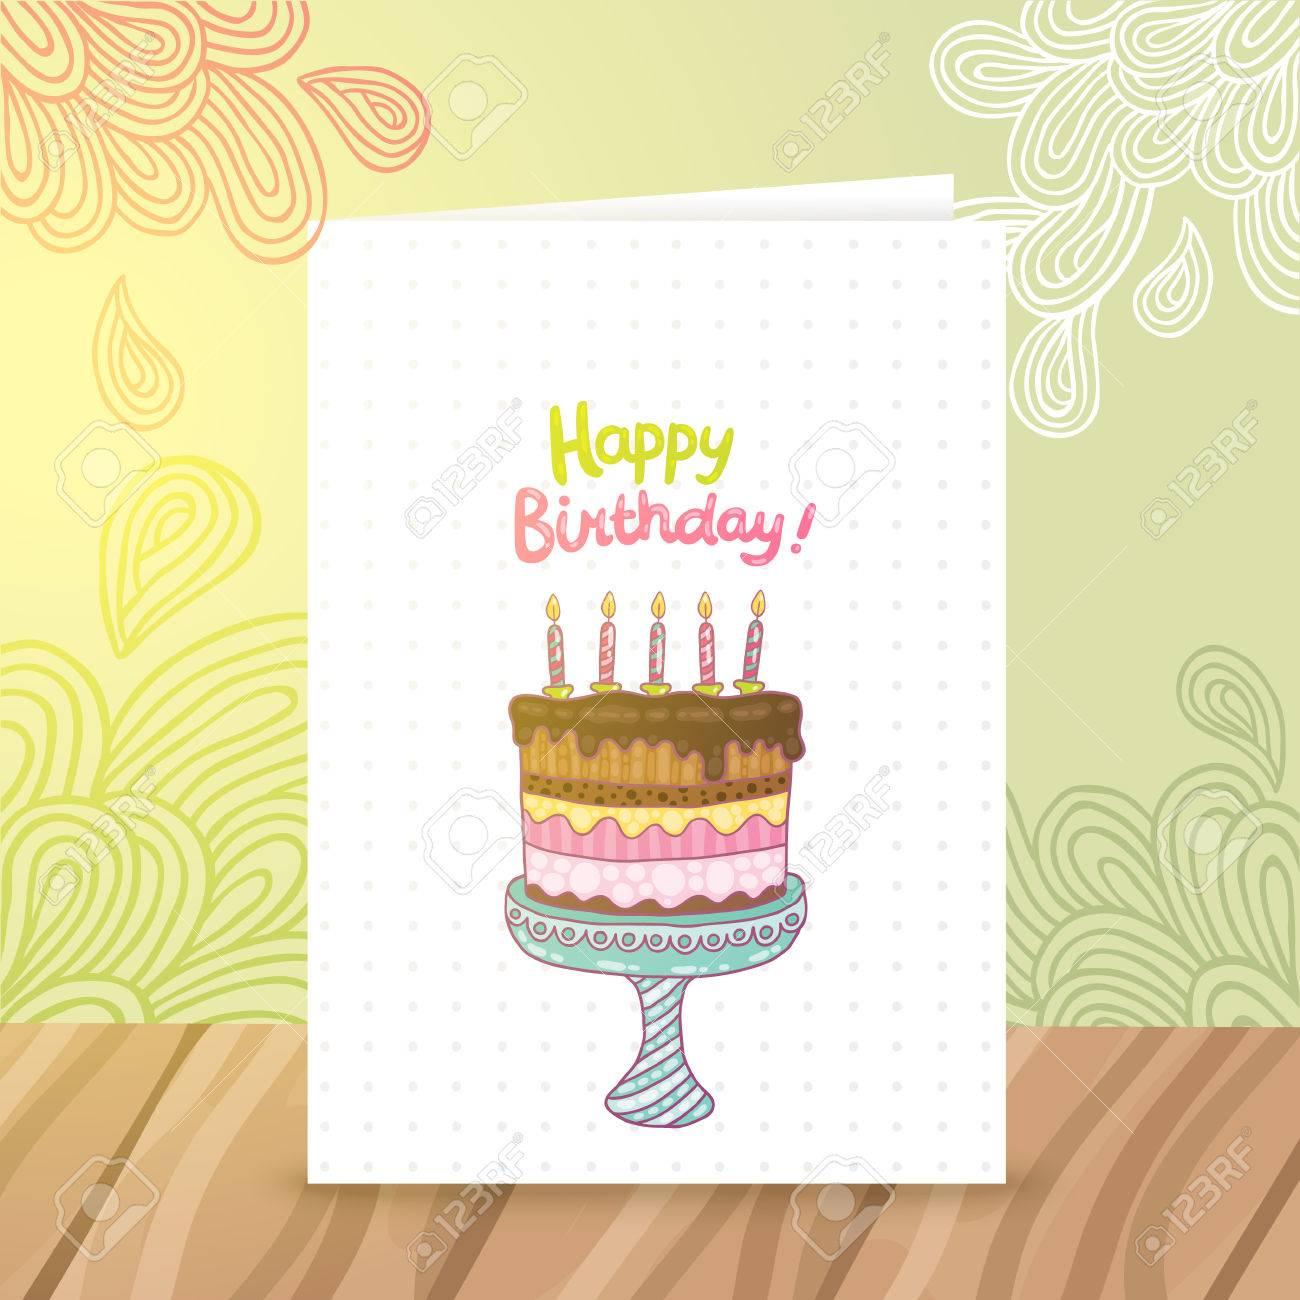 Plantilla De La Postal De La Historieta Linda Del Feliz Cumpleaños ...